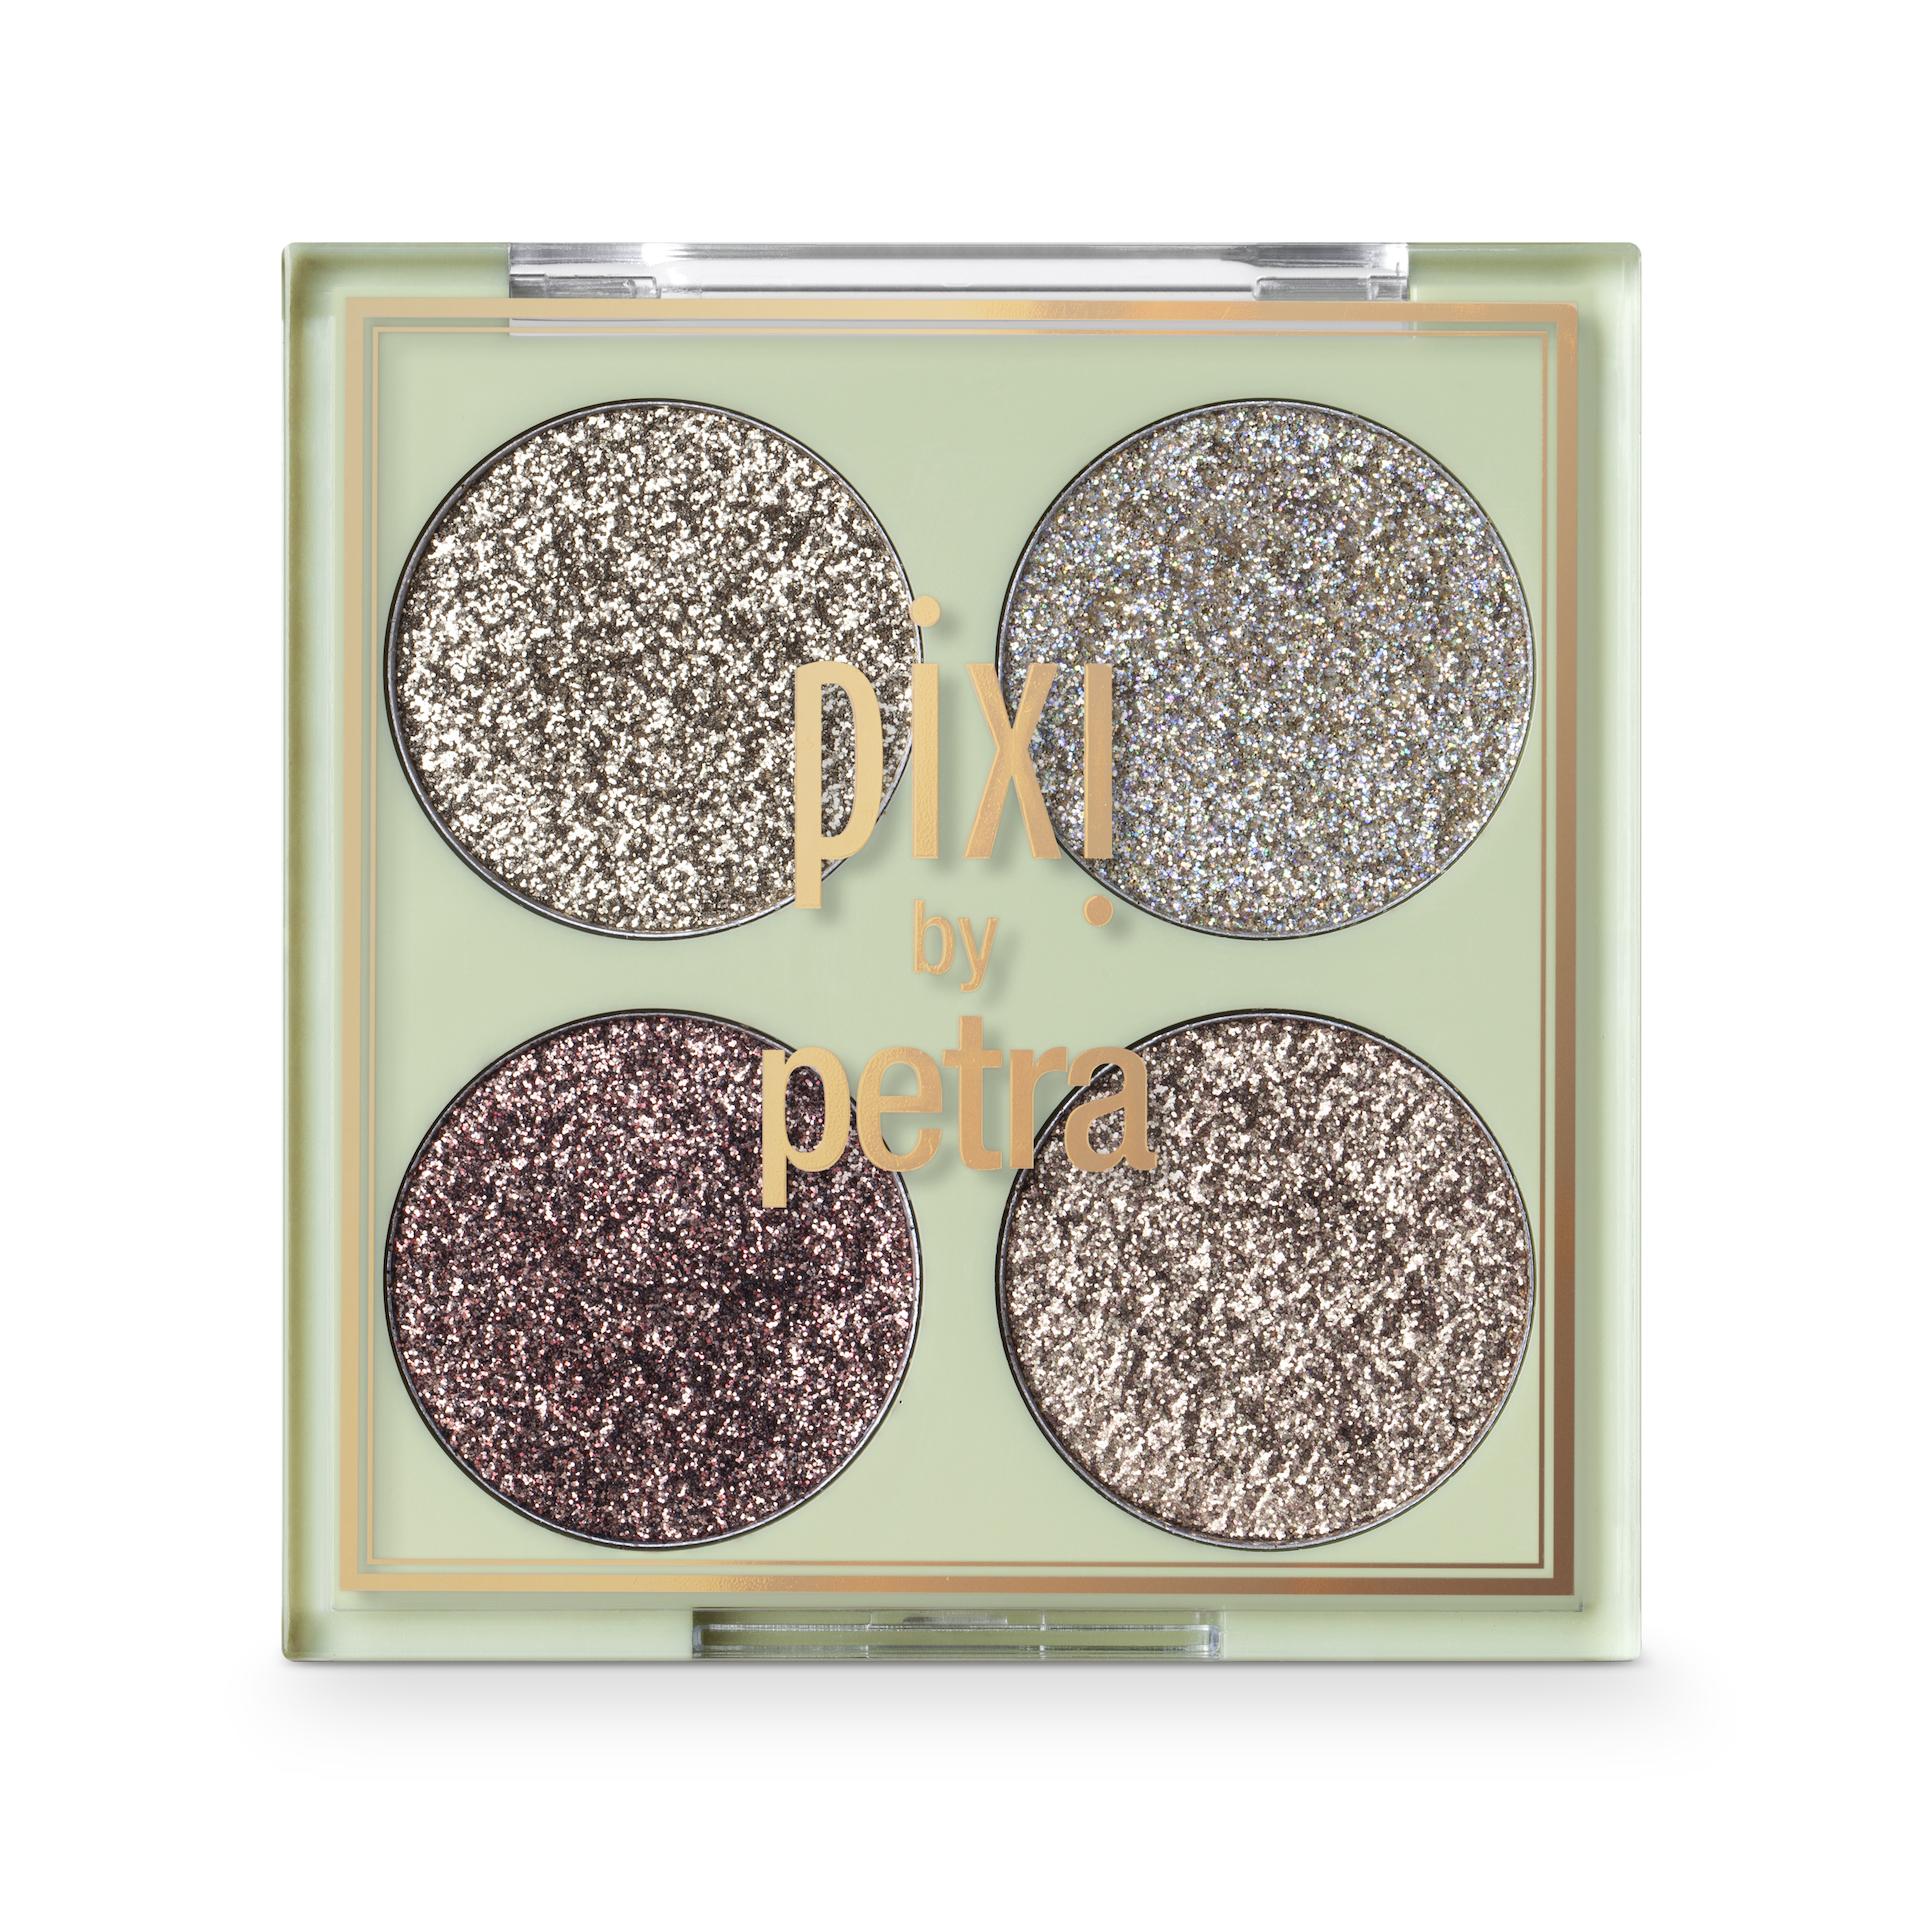 Glitter-y Eye Quad Eyecolor Kit GoldLava